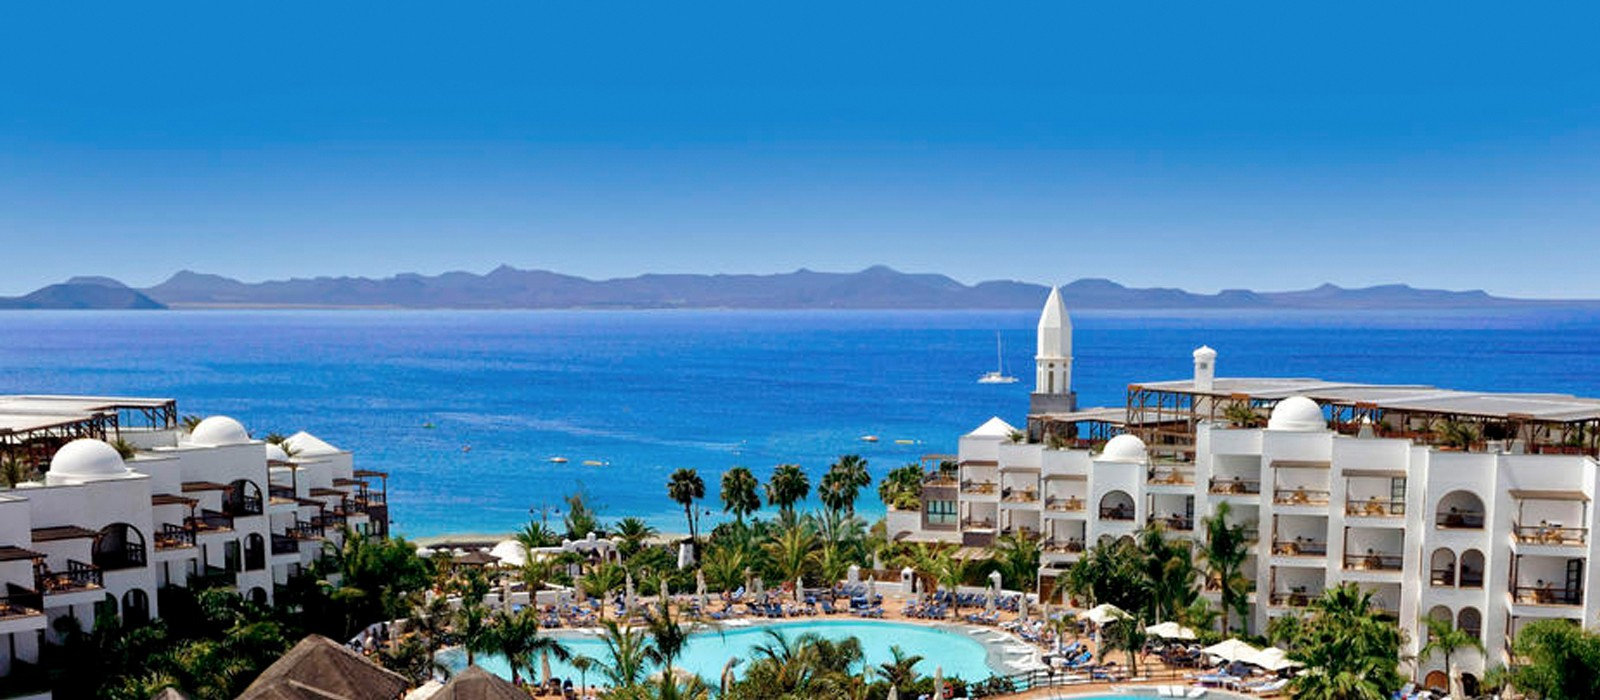 Header - Princesa Yaiza Hotel - Luxuxry Gran Canaria Holidays